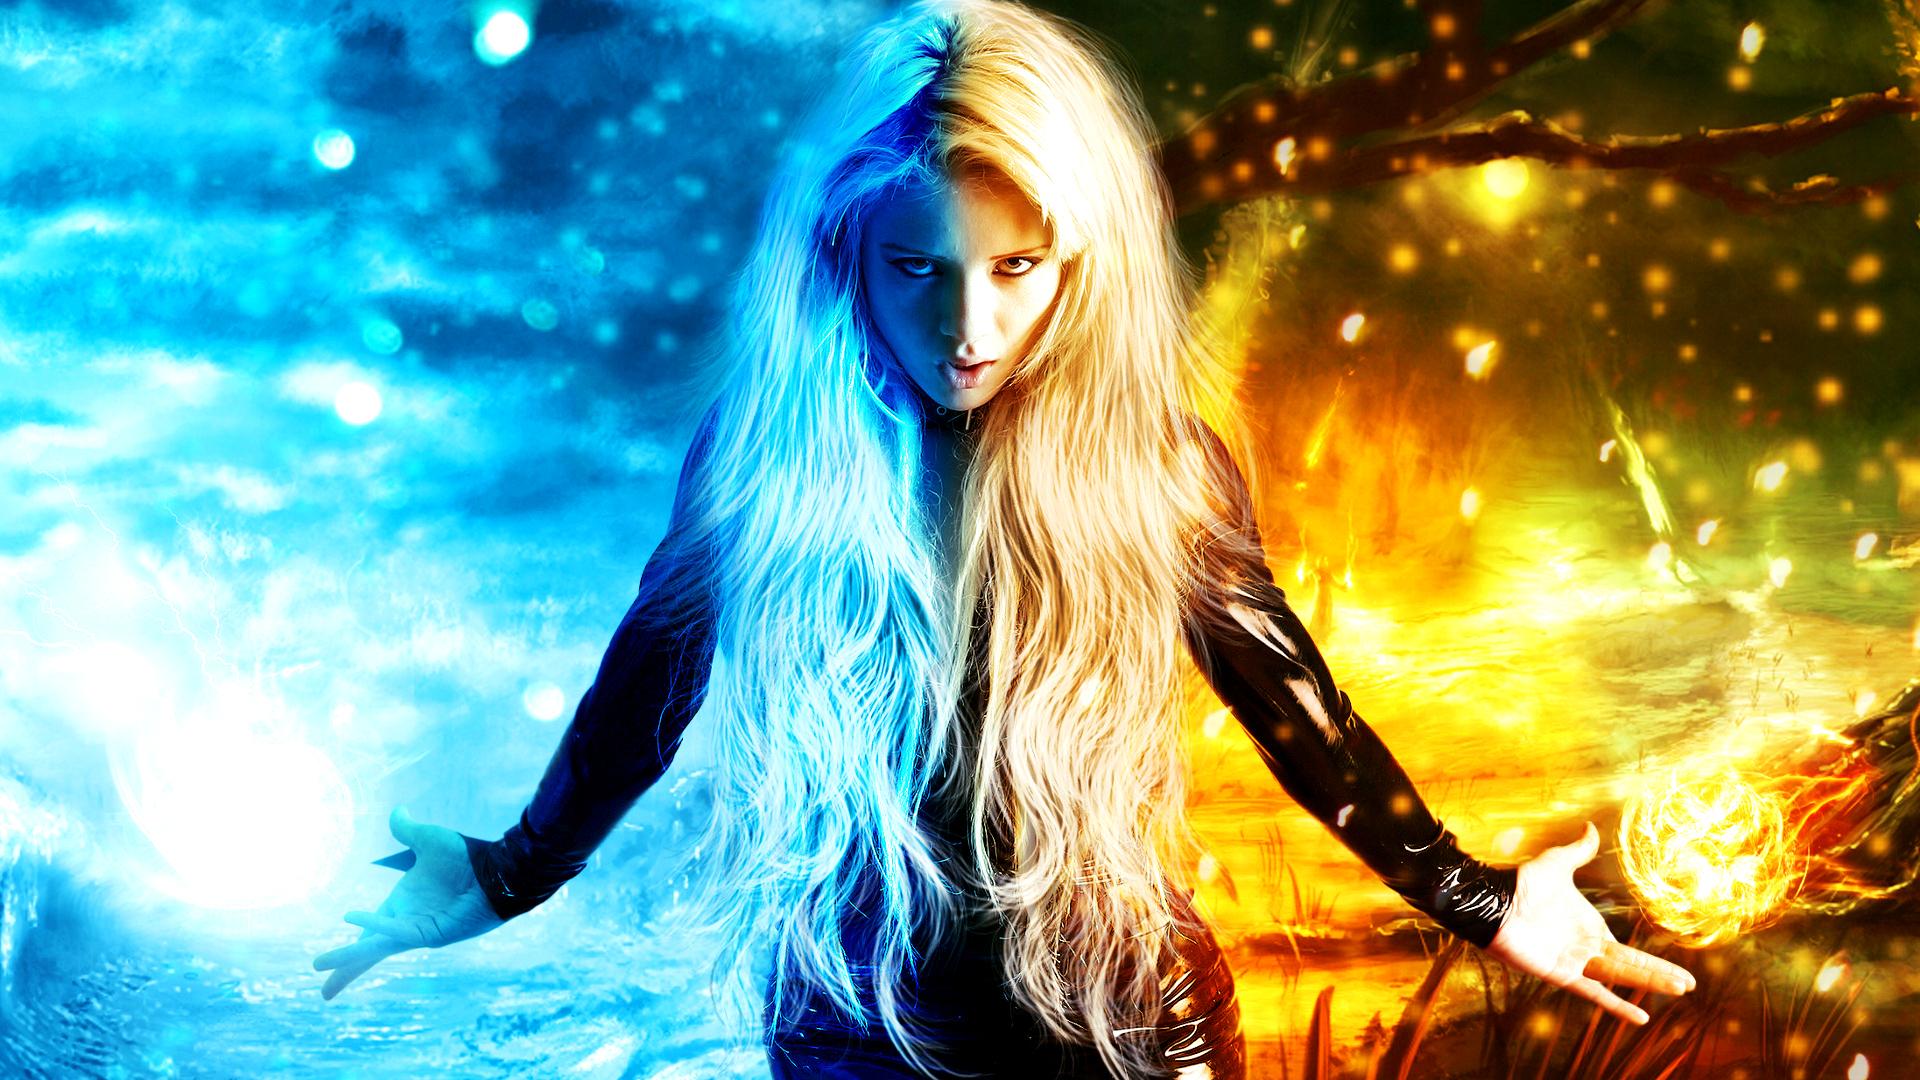 fantasy girl wallpaper | top wallpapers